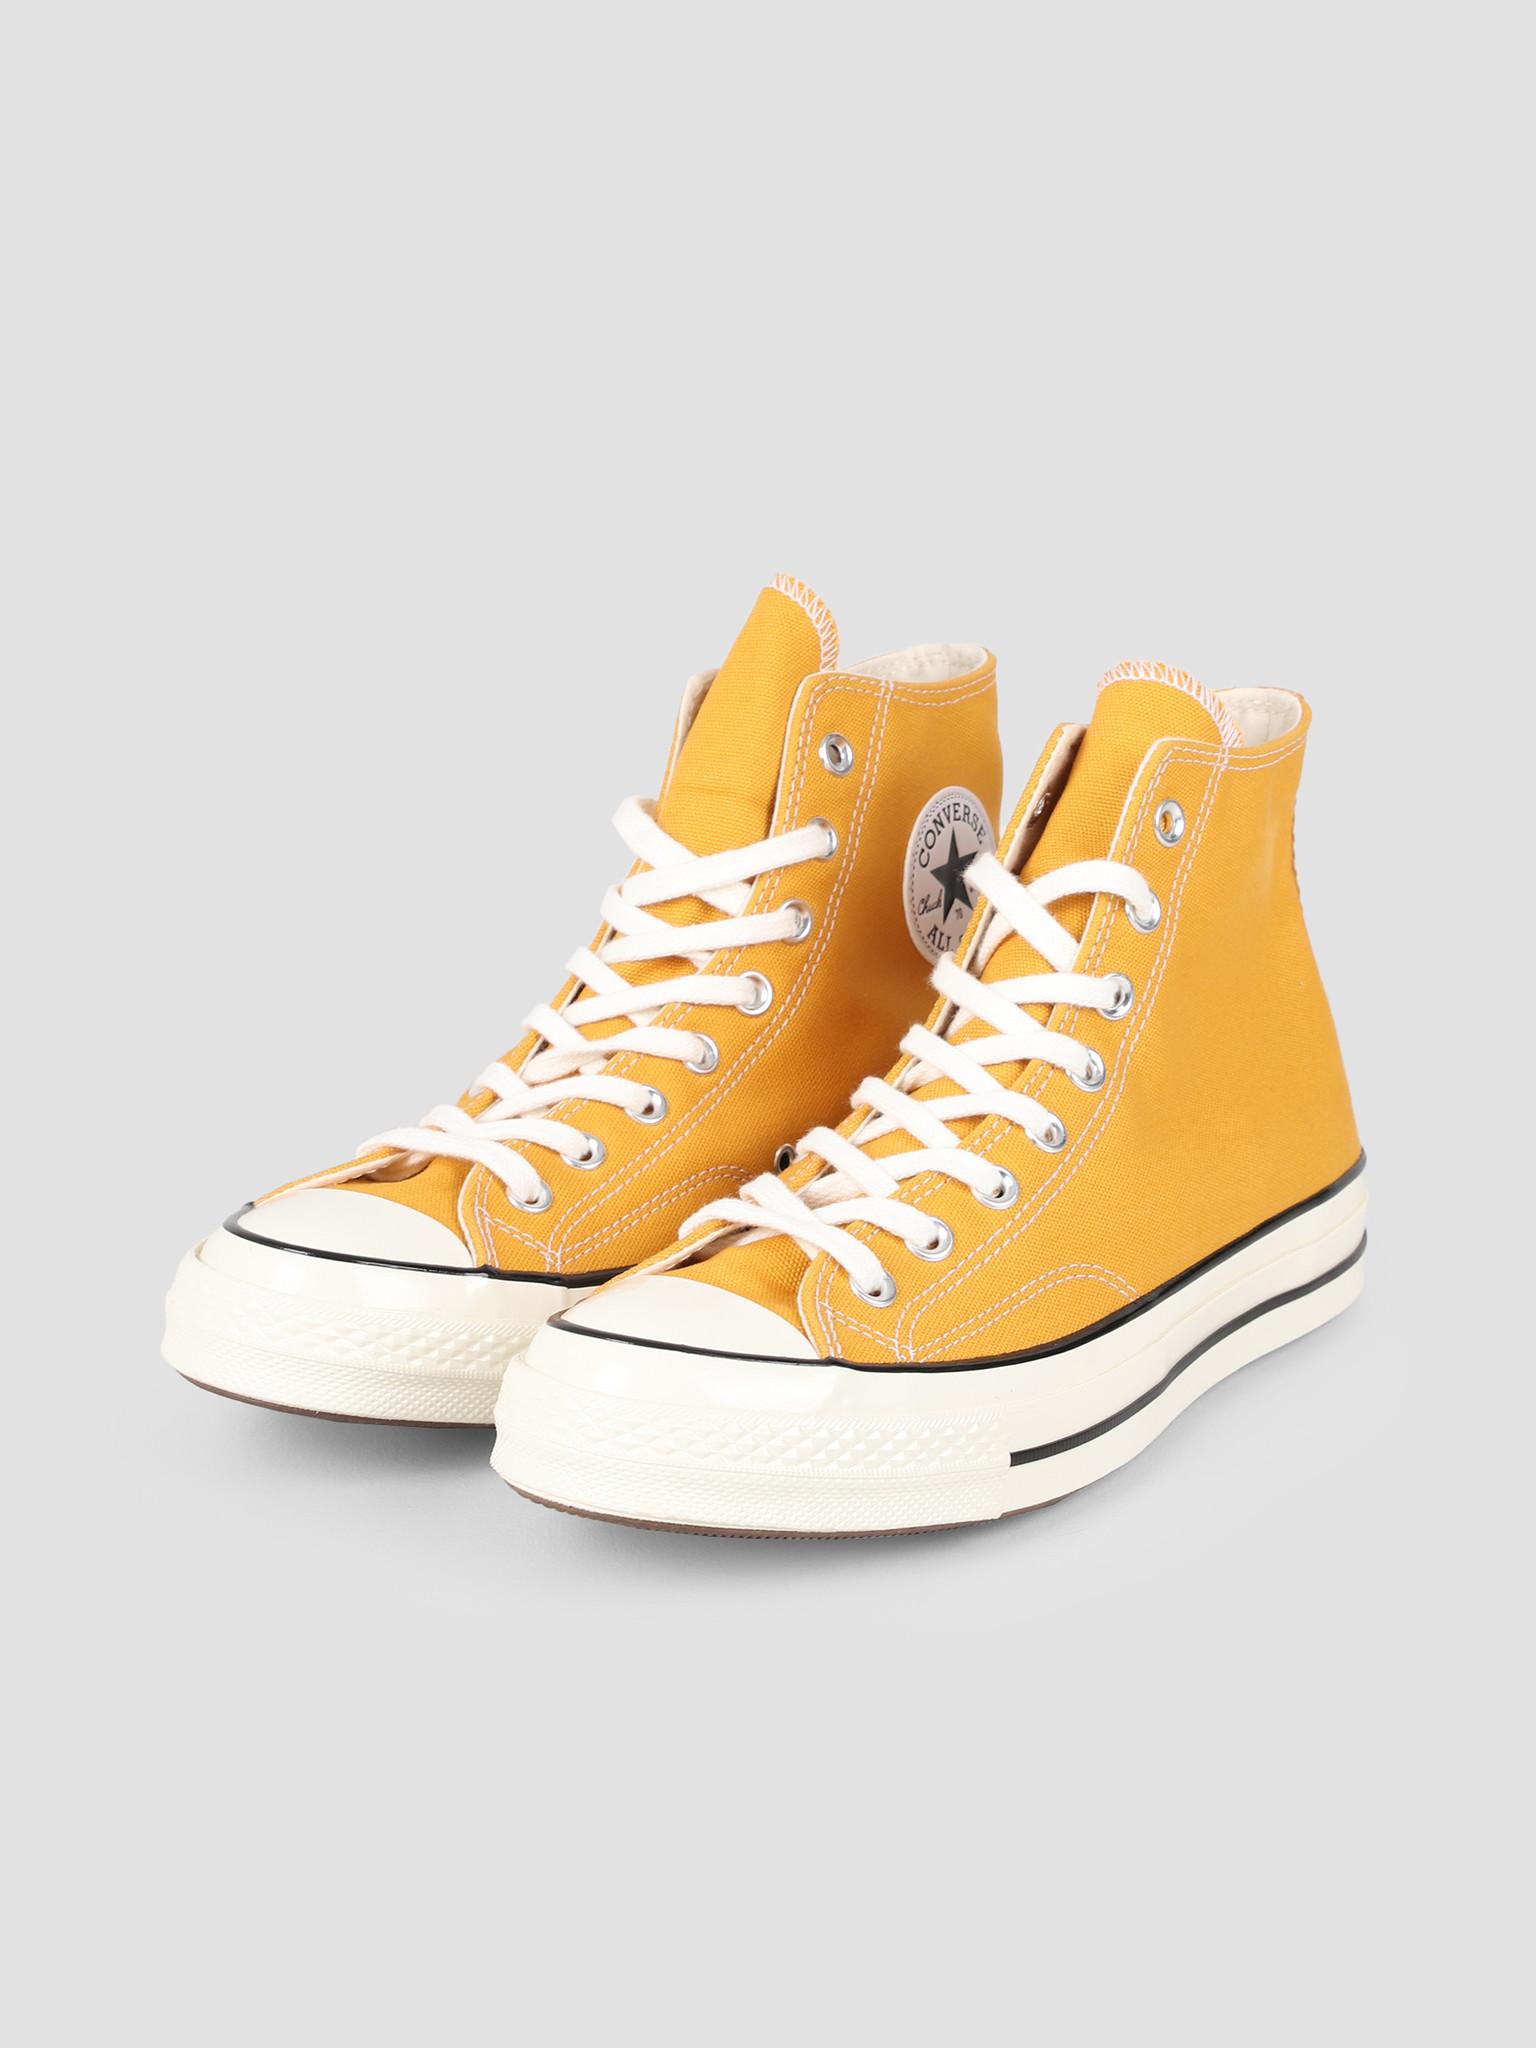 Converse Converse Chuck 70 HI Sunflower Black Egret 162054C